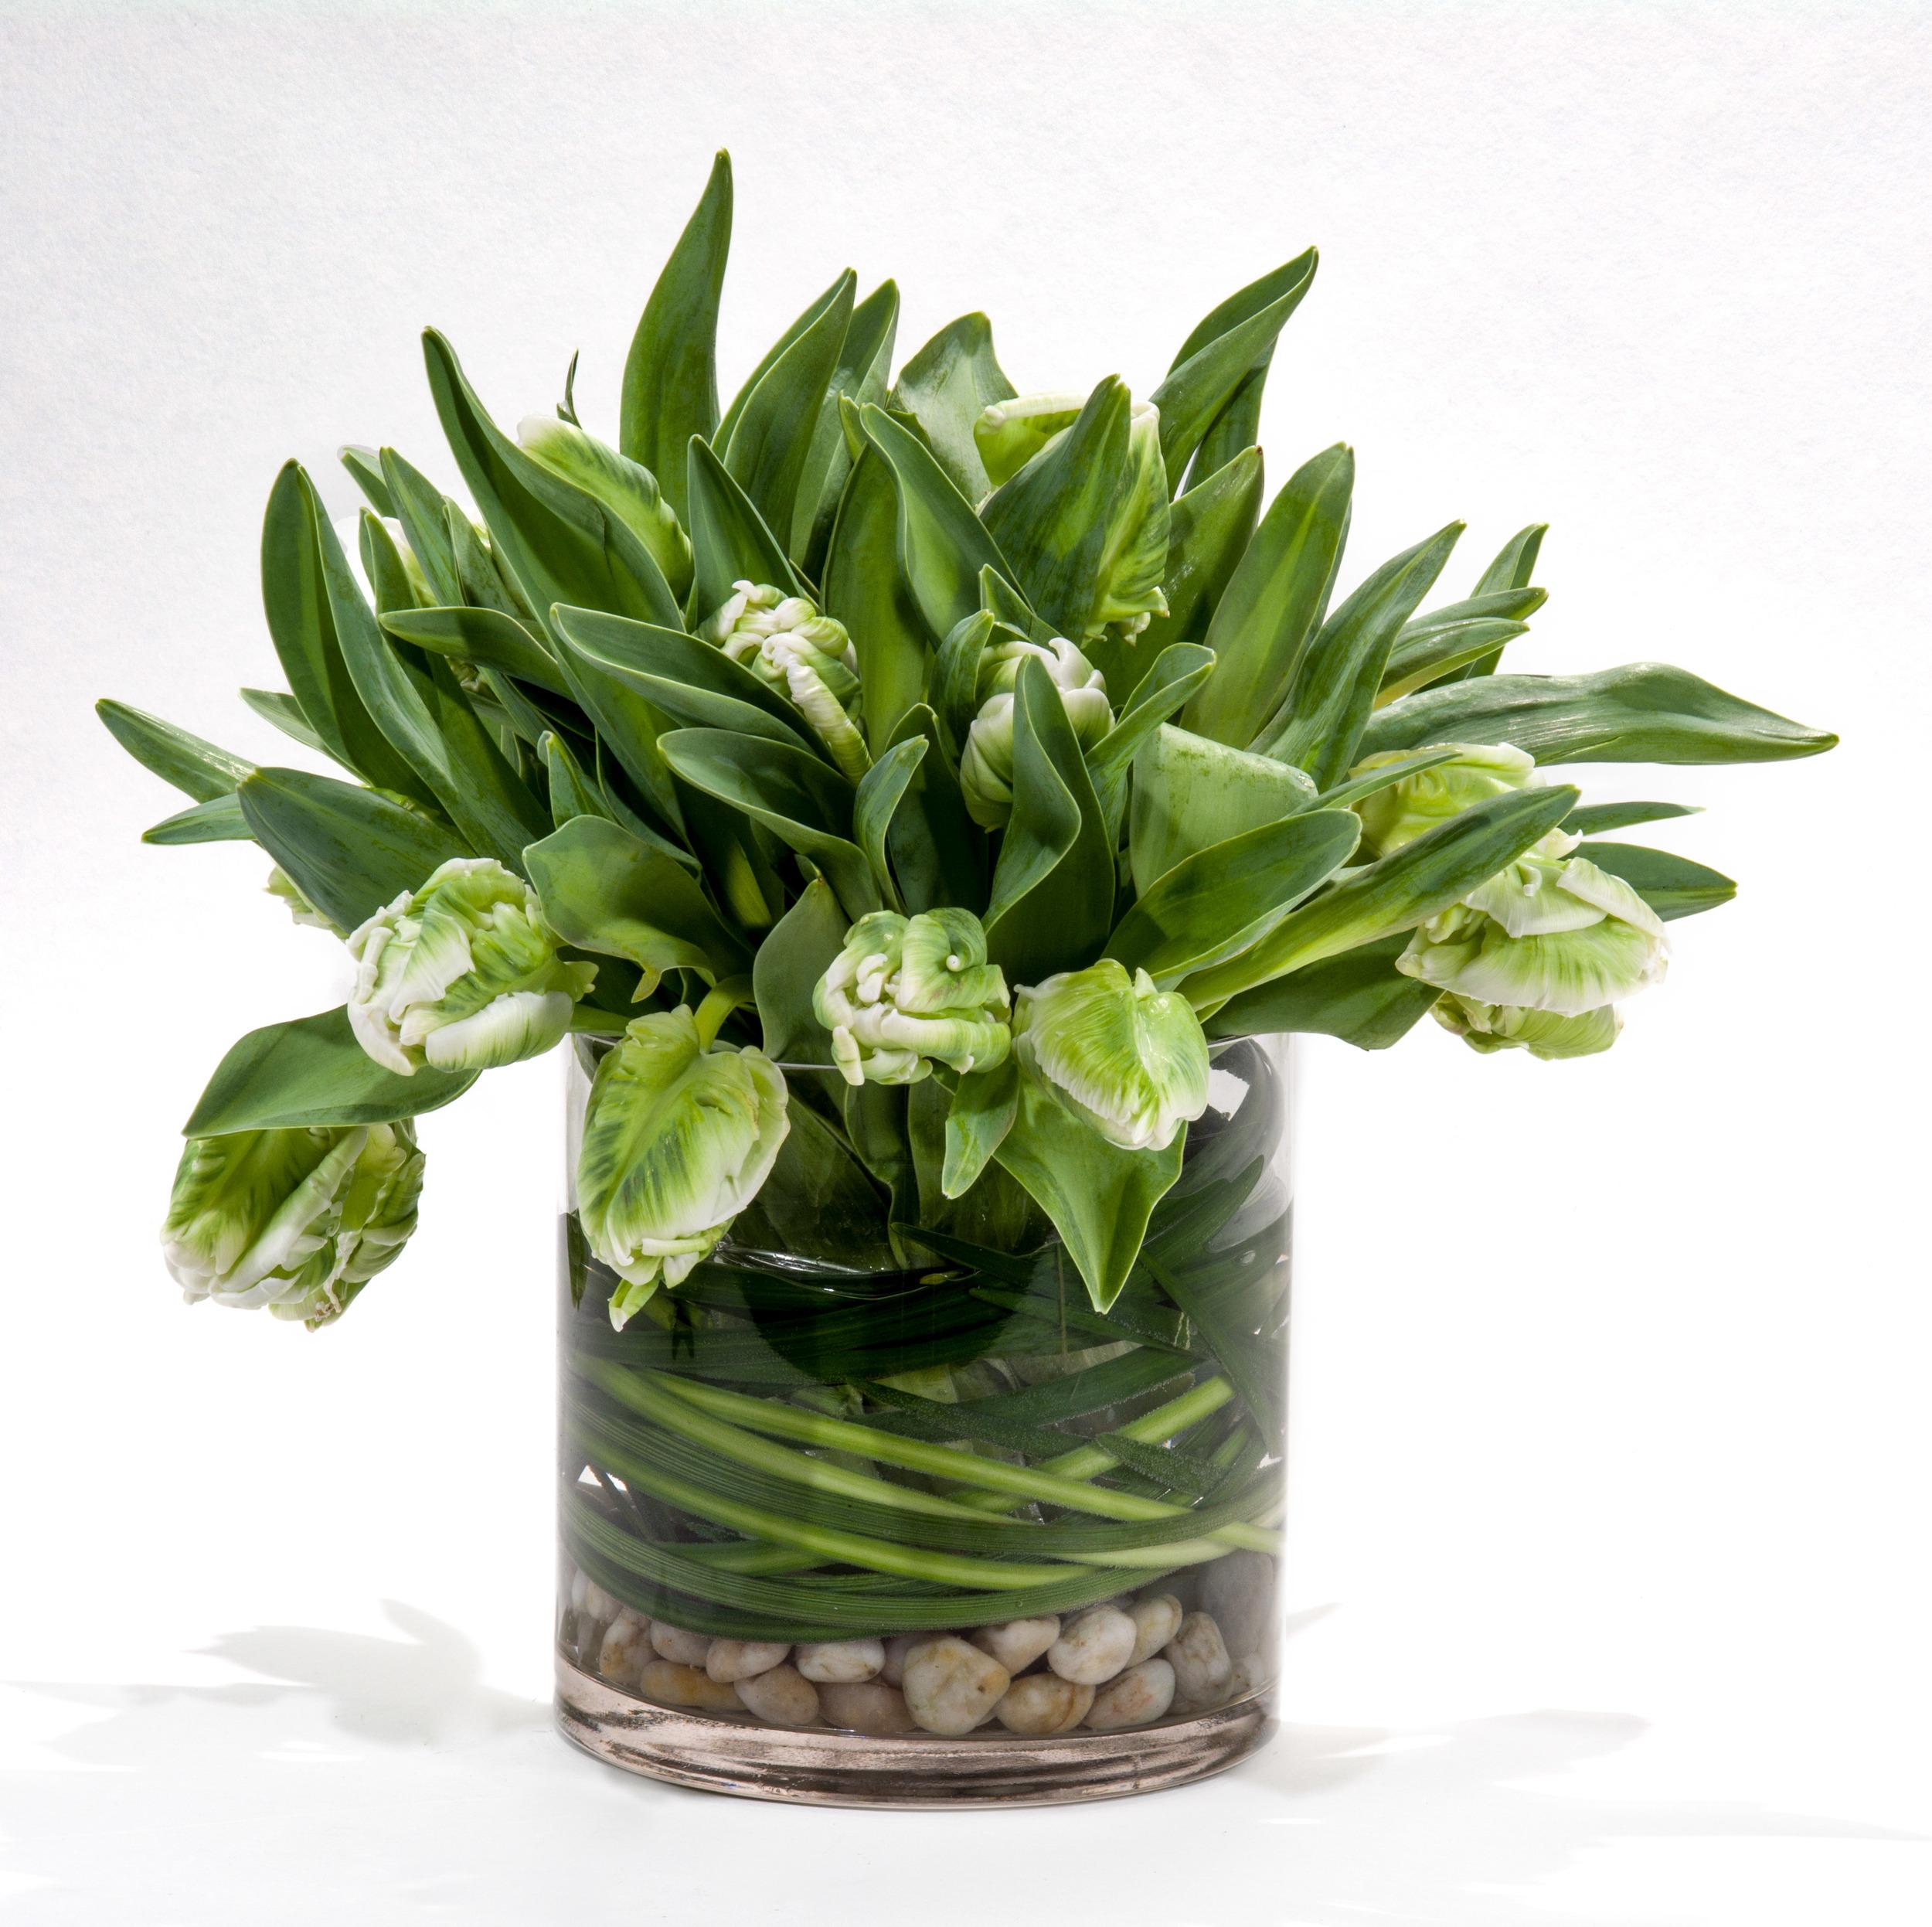 Green tulips - full size hi res-1.jpg